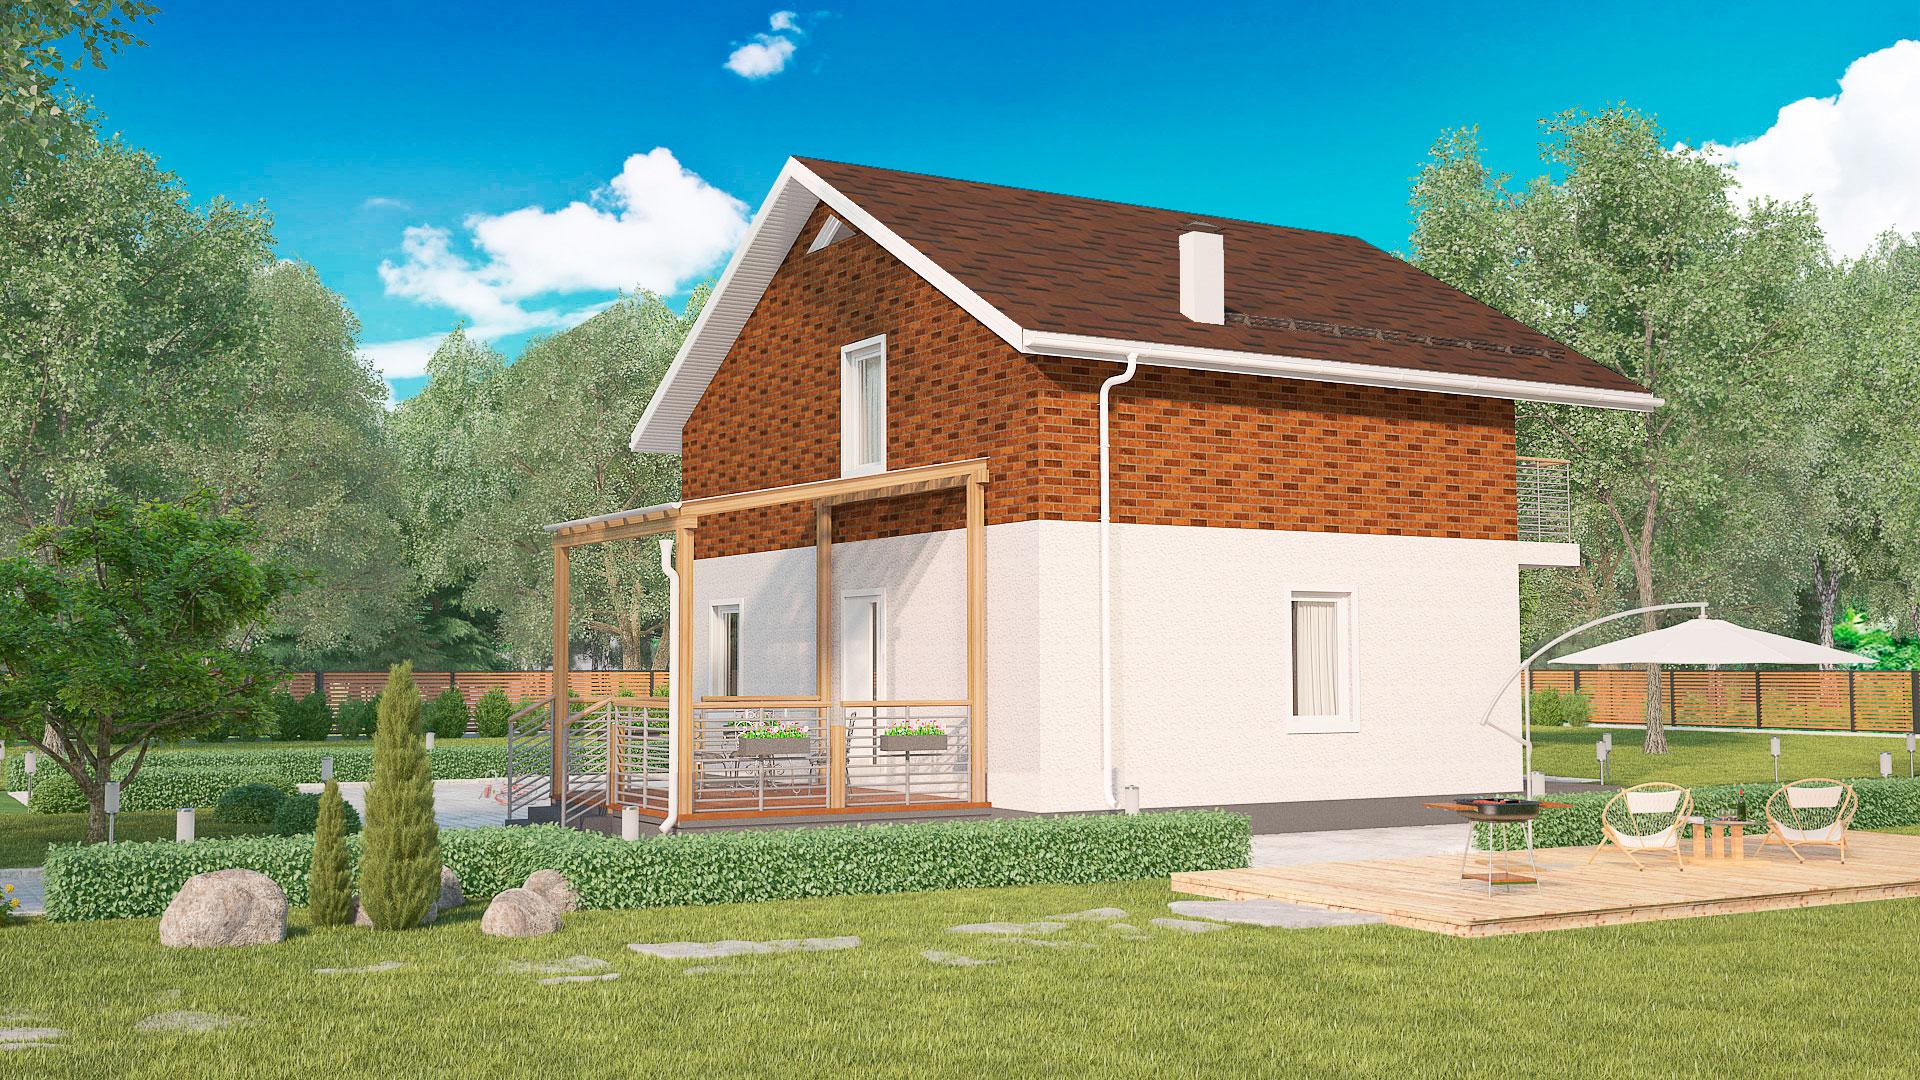 Задний фасад двухэтажного дома с террасой, проект БЭНПАН МС-164/1/К.